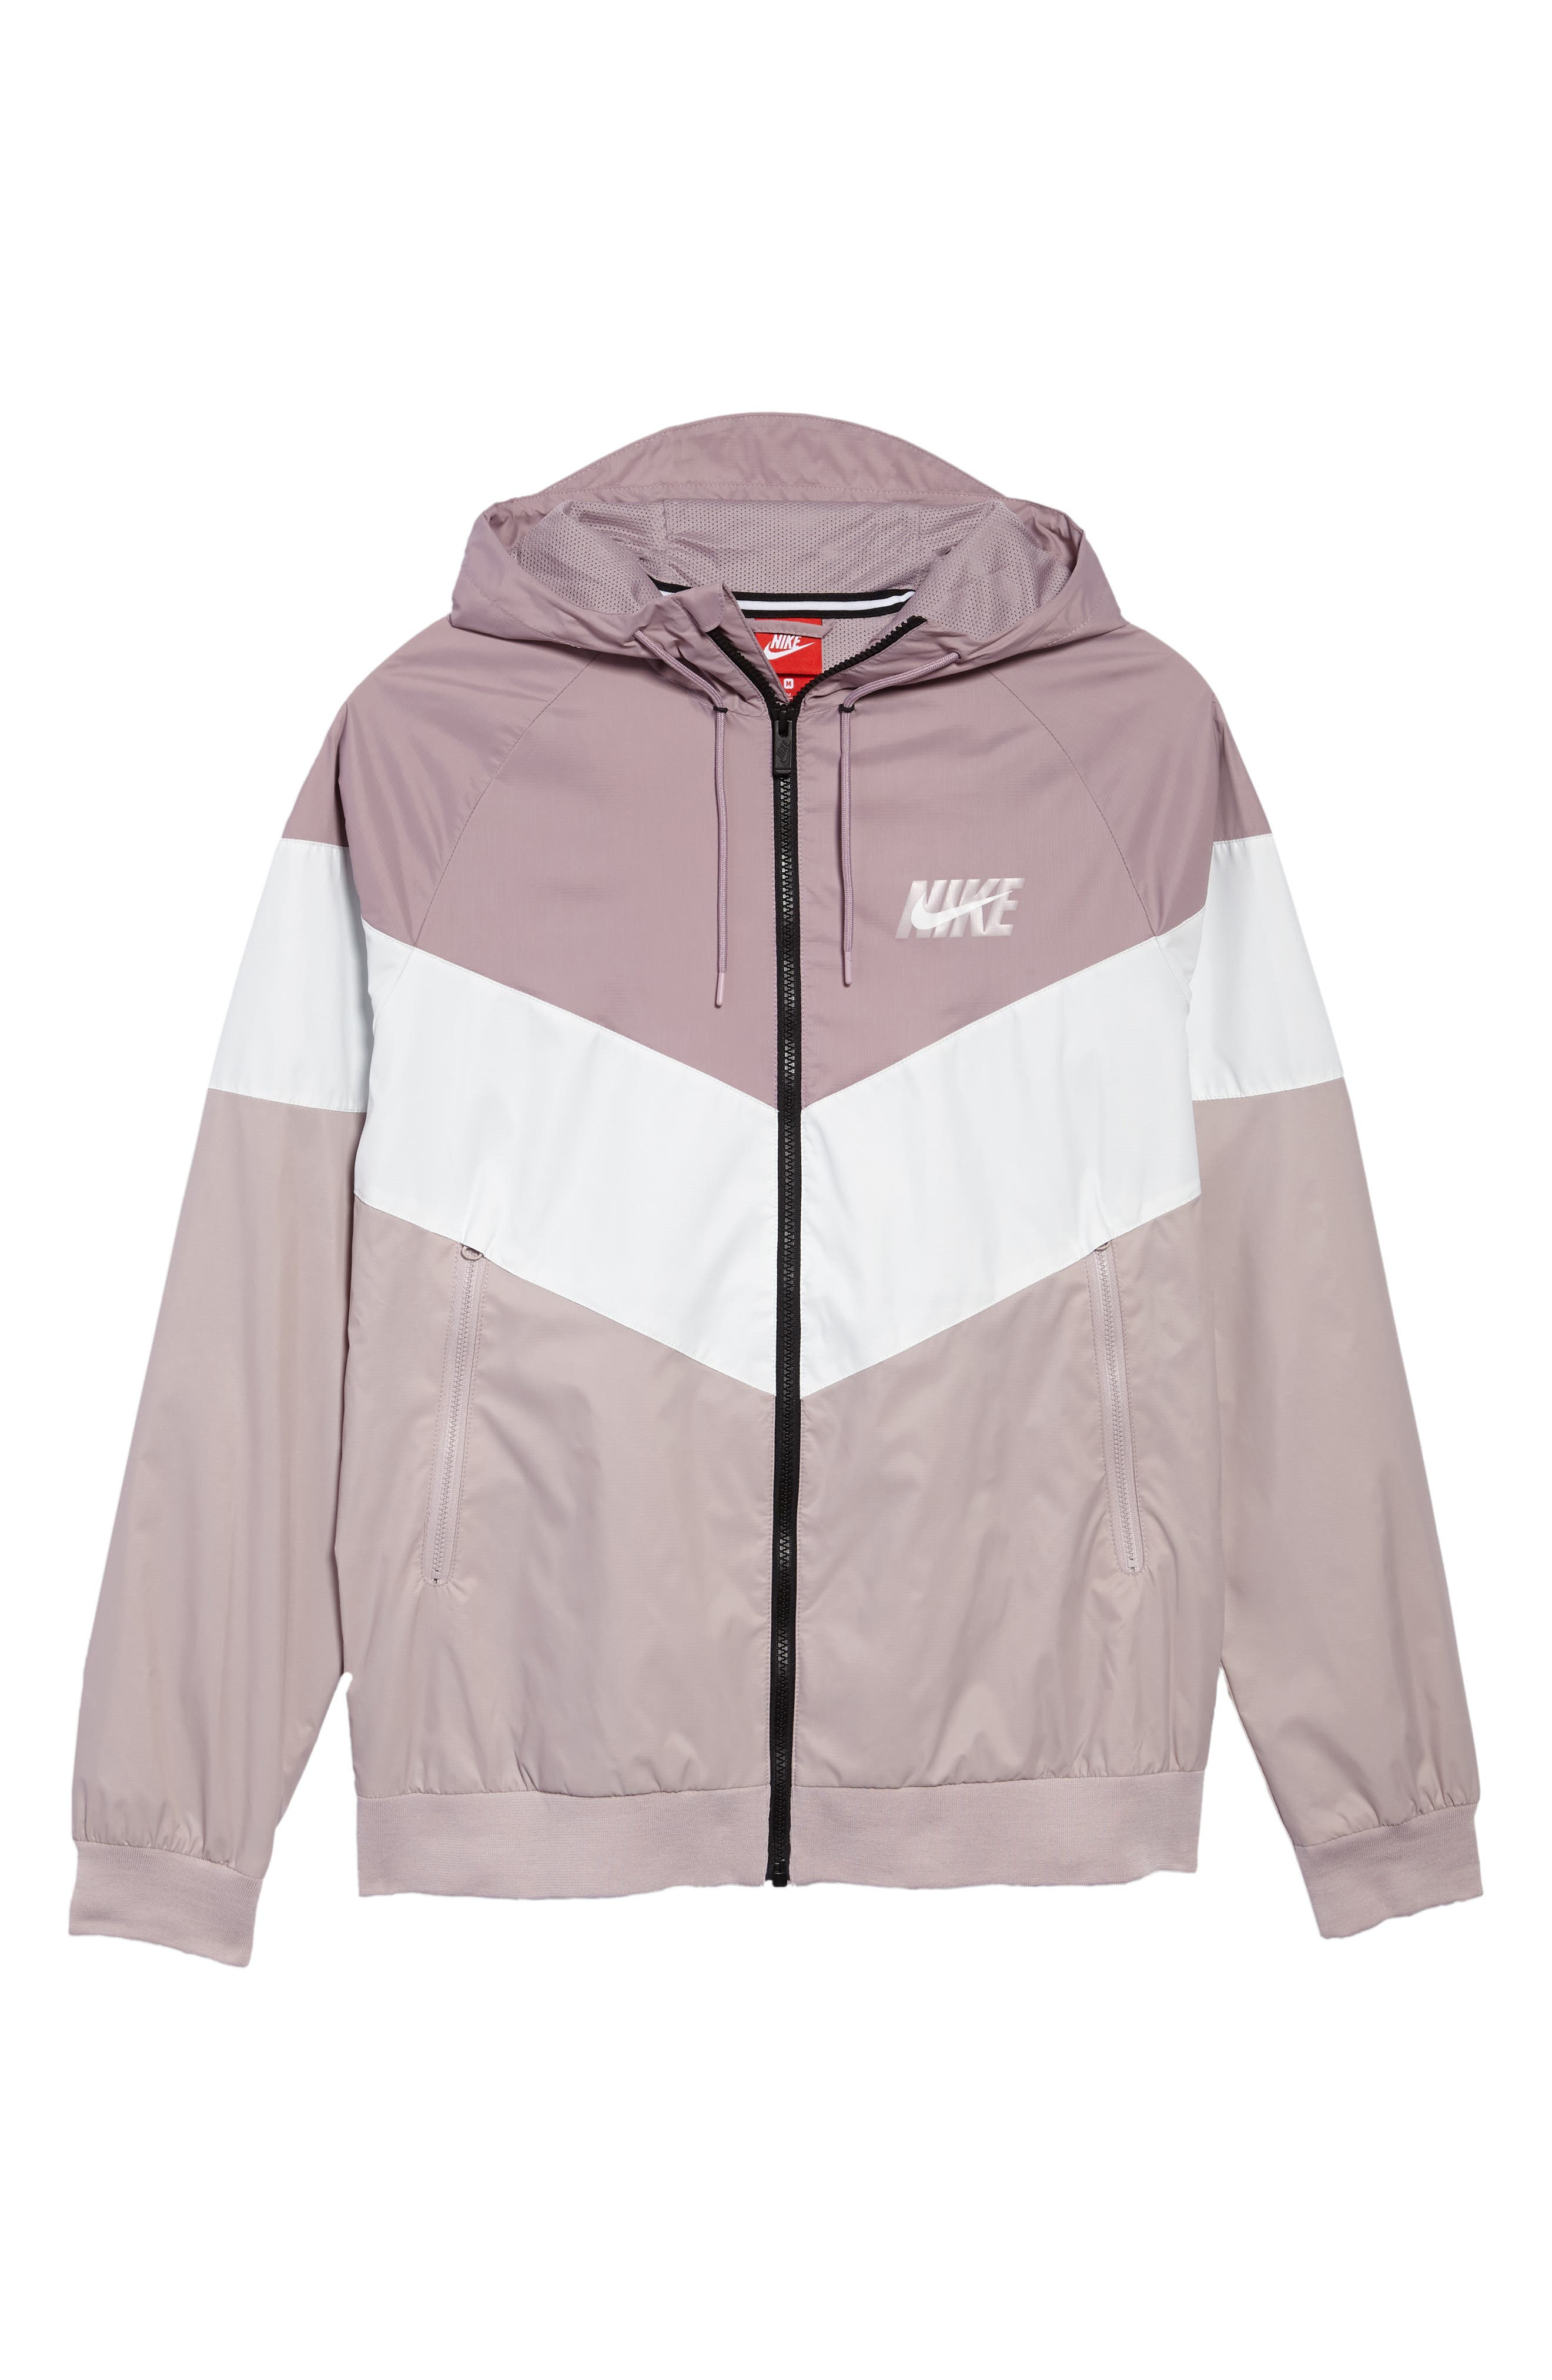 Windrunner Wind & Water Repellent Hooded Jacket,                             Alternate thumbnail 6, color,                             Elemental Rose/ Summit White